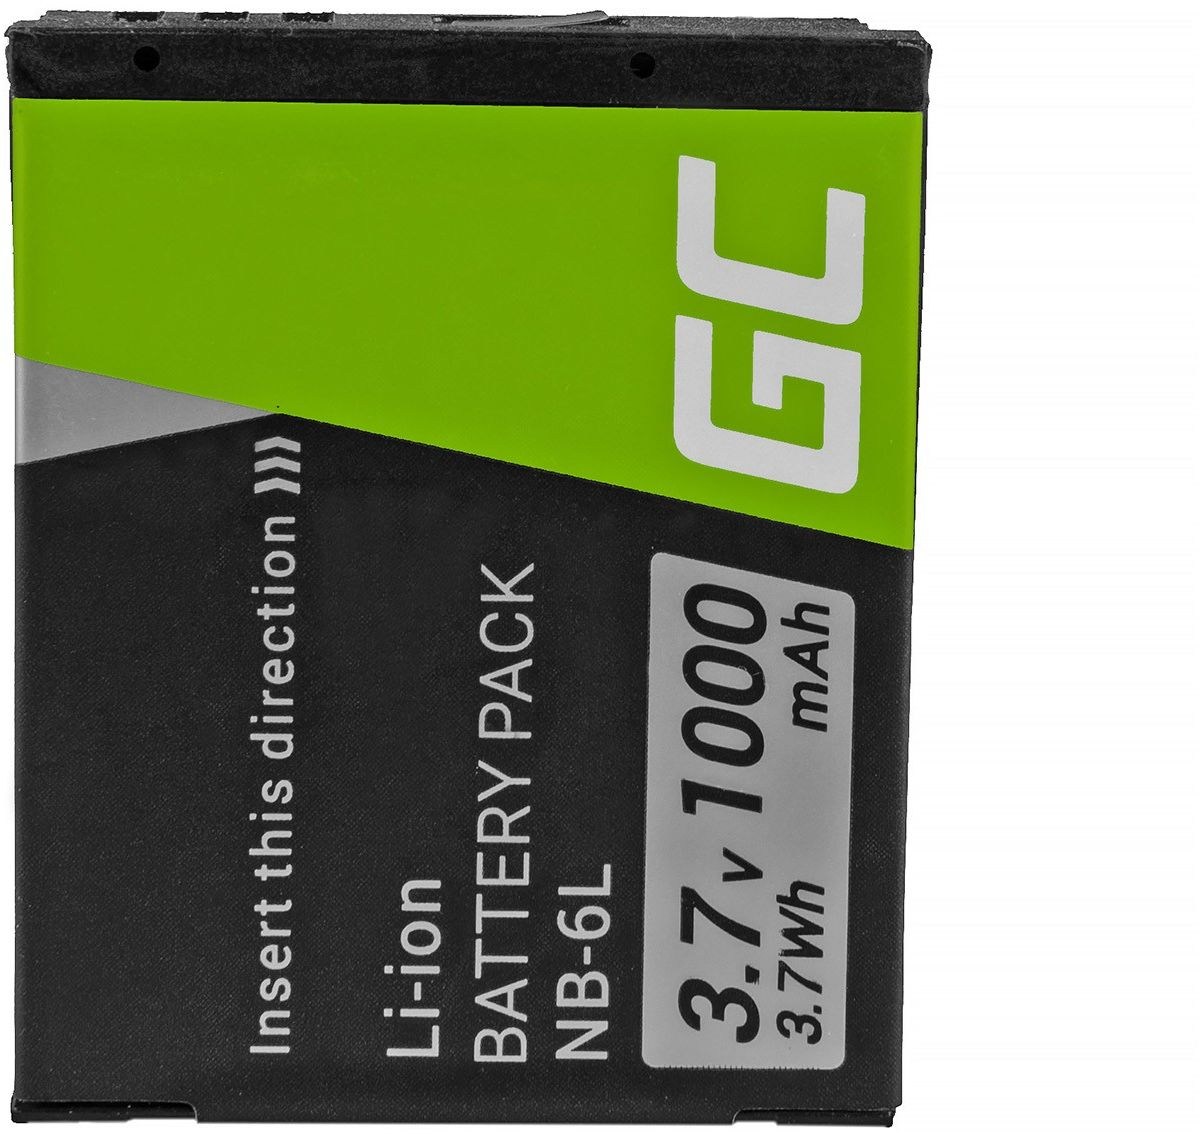 Akumulator Bateria Green Cell  NB-6L do Canon PowerShot ELPH 500HS SX 240HS 260HS 270HS 280HS 510HS 520HS 530HS 3.7V 1000mAh